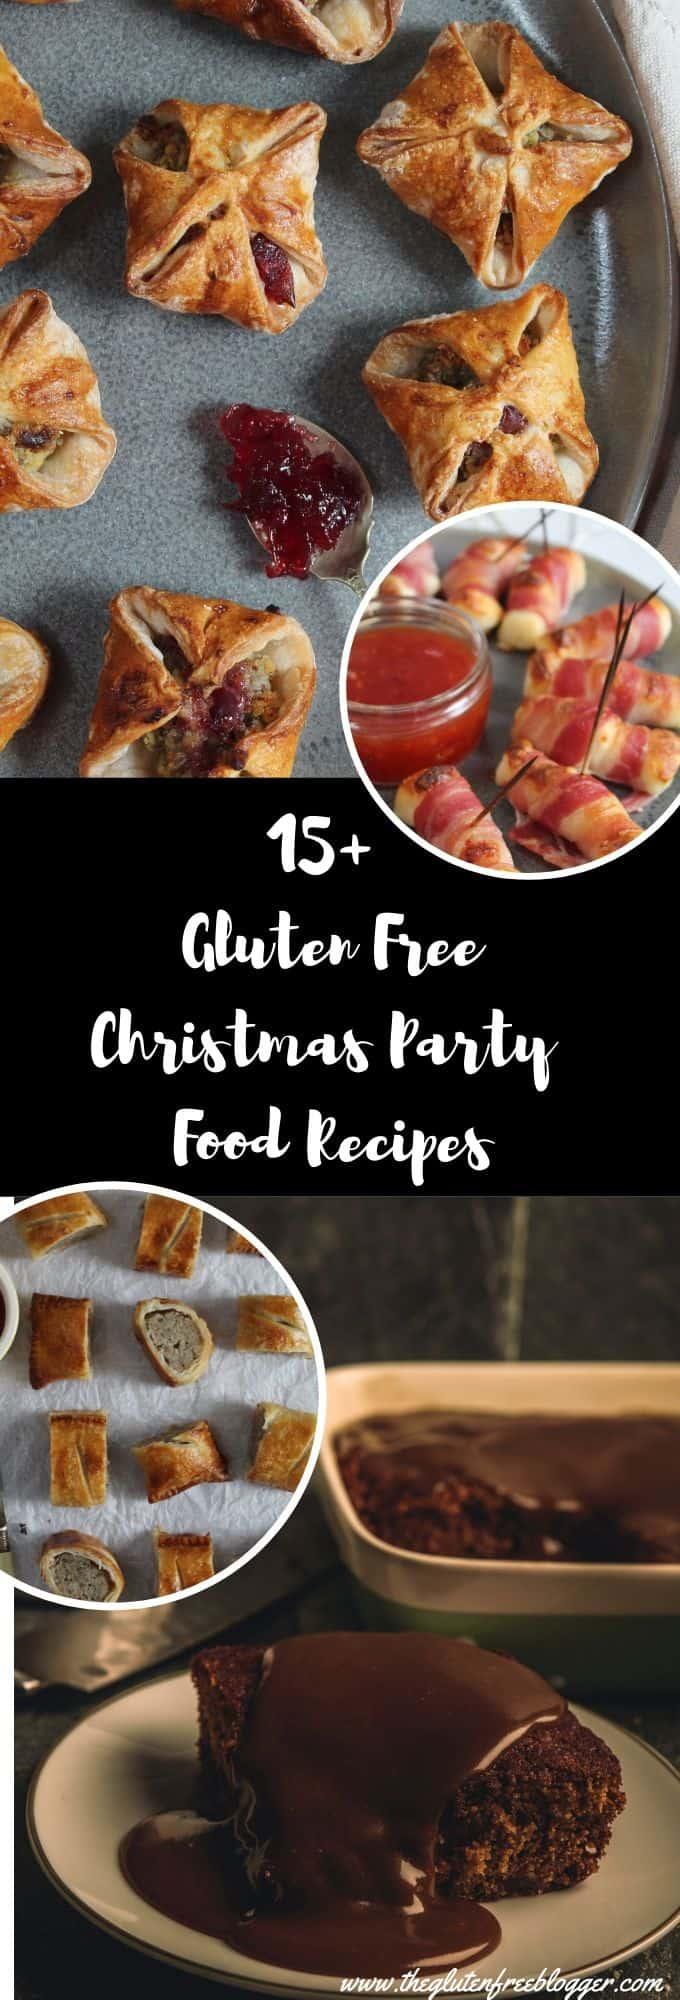 gluten free christmas party food recipe round-up ideas dairy free coeliac